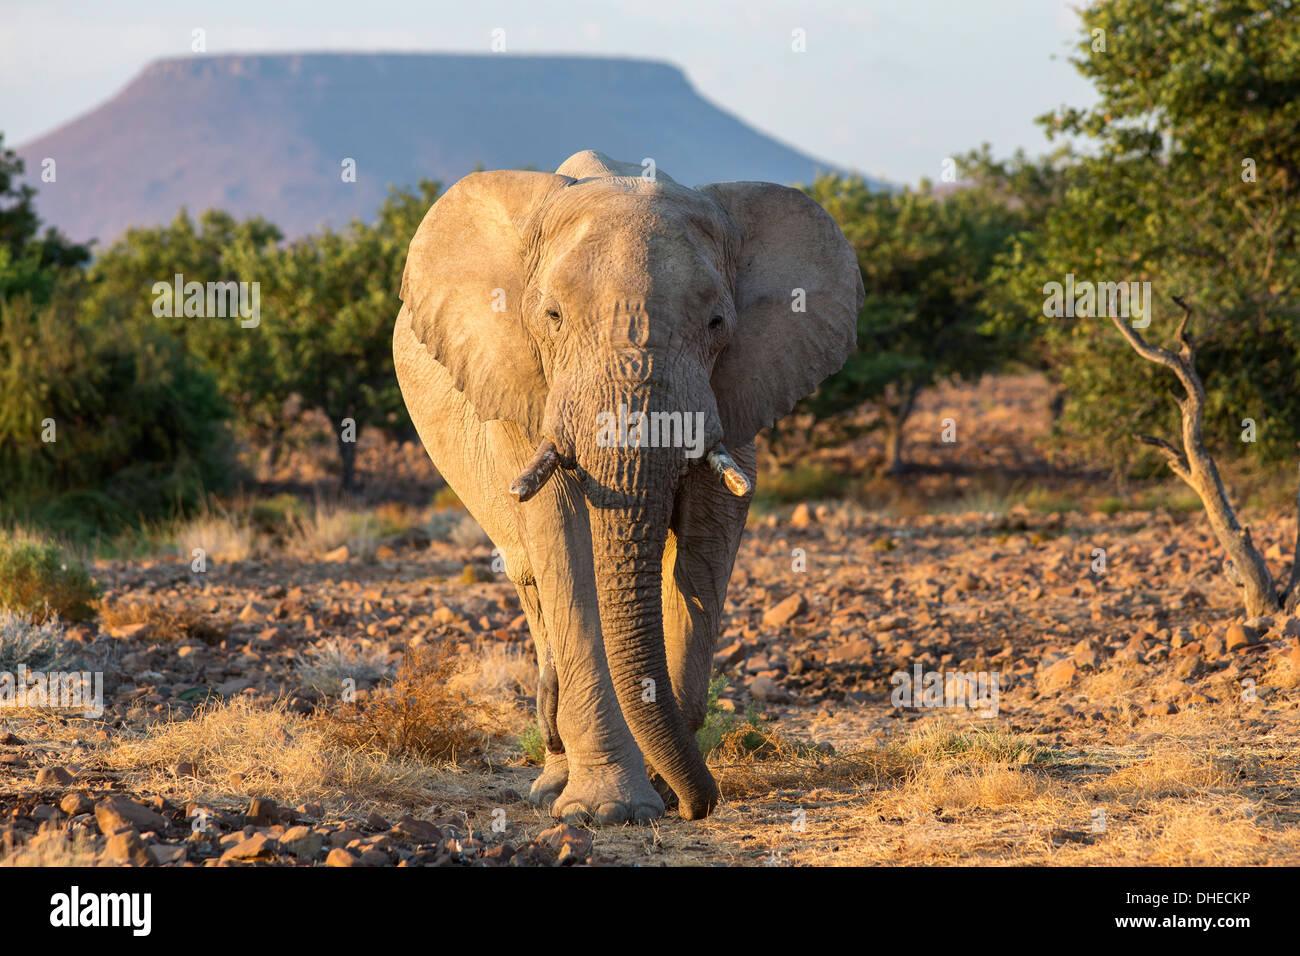 Elefante africano (Loxodonta africana), Damaraland, Kunene, Namibia, Africa Immagini Stock